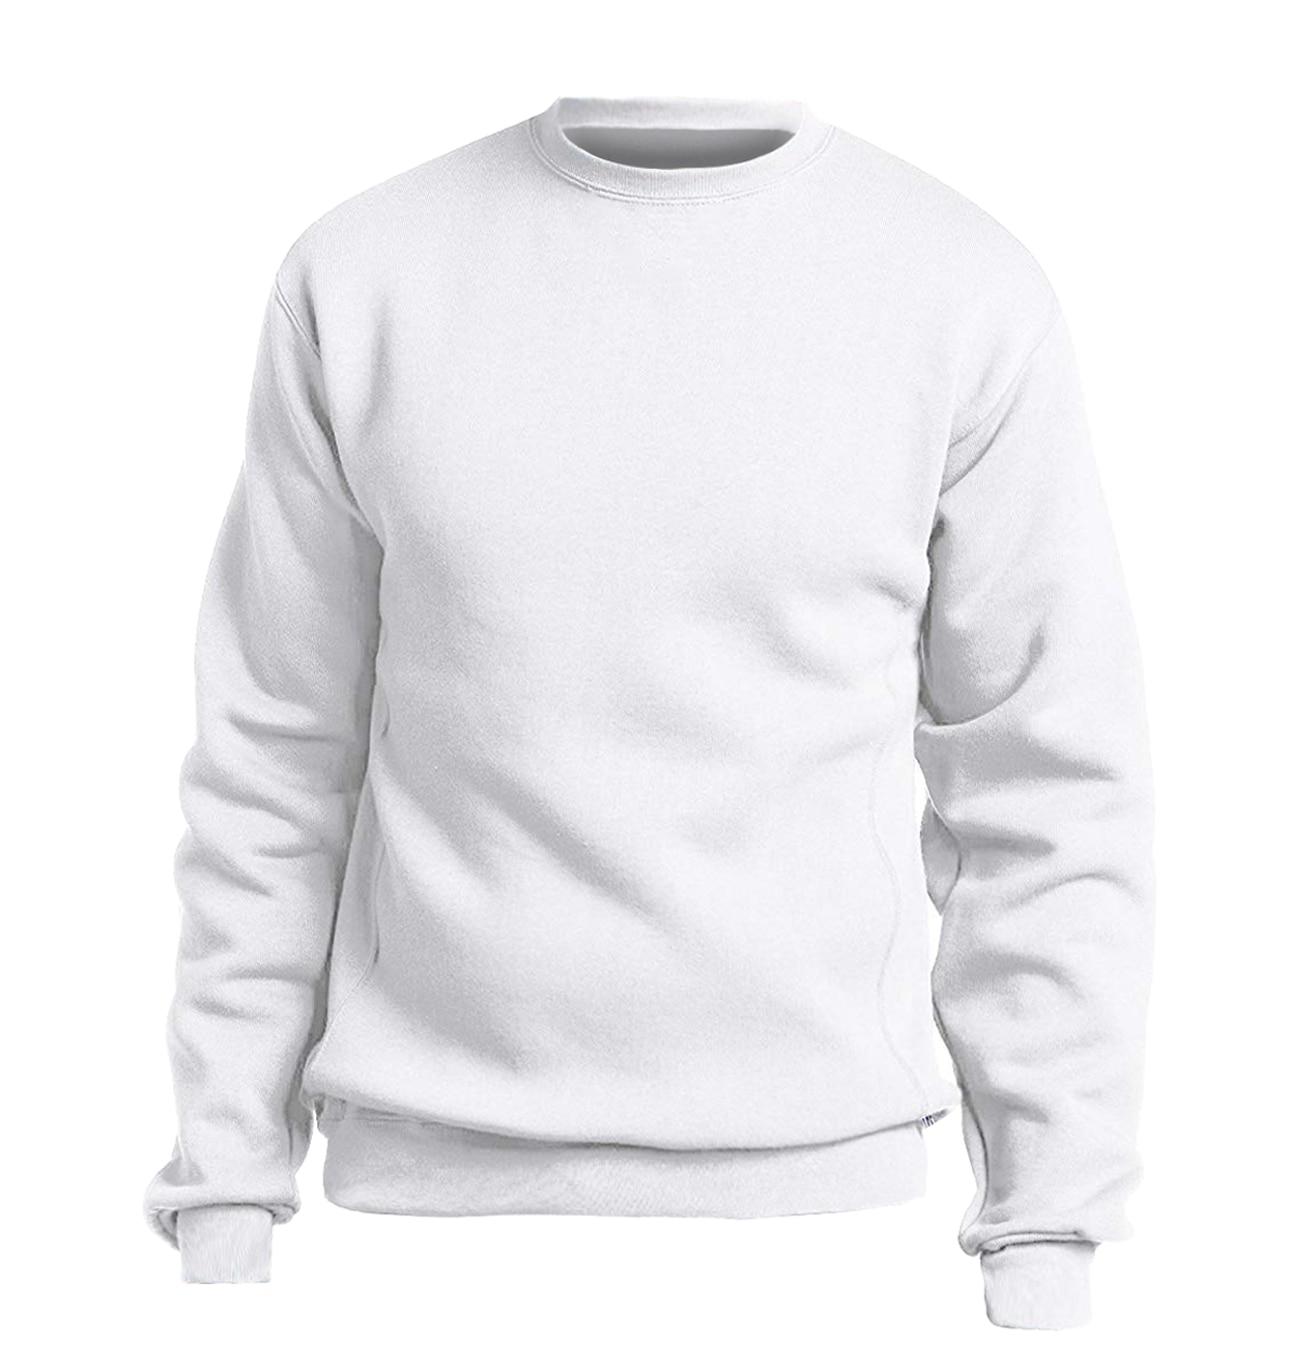 Solid color Sweatshirt Men Hoodie Crewneck Sweatshirts Winter Autumn Fleece Hoody Casual Gray Blue Red Black White Streetwear 13